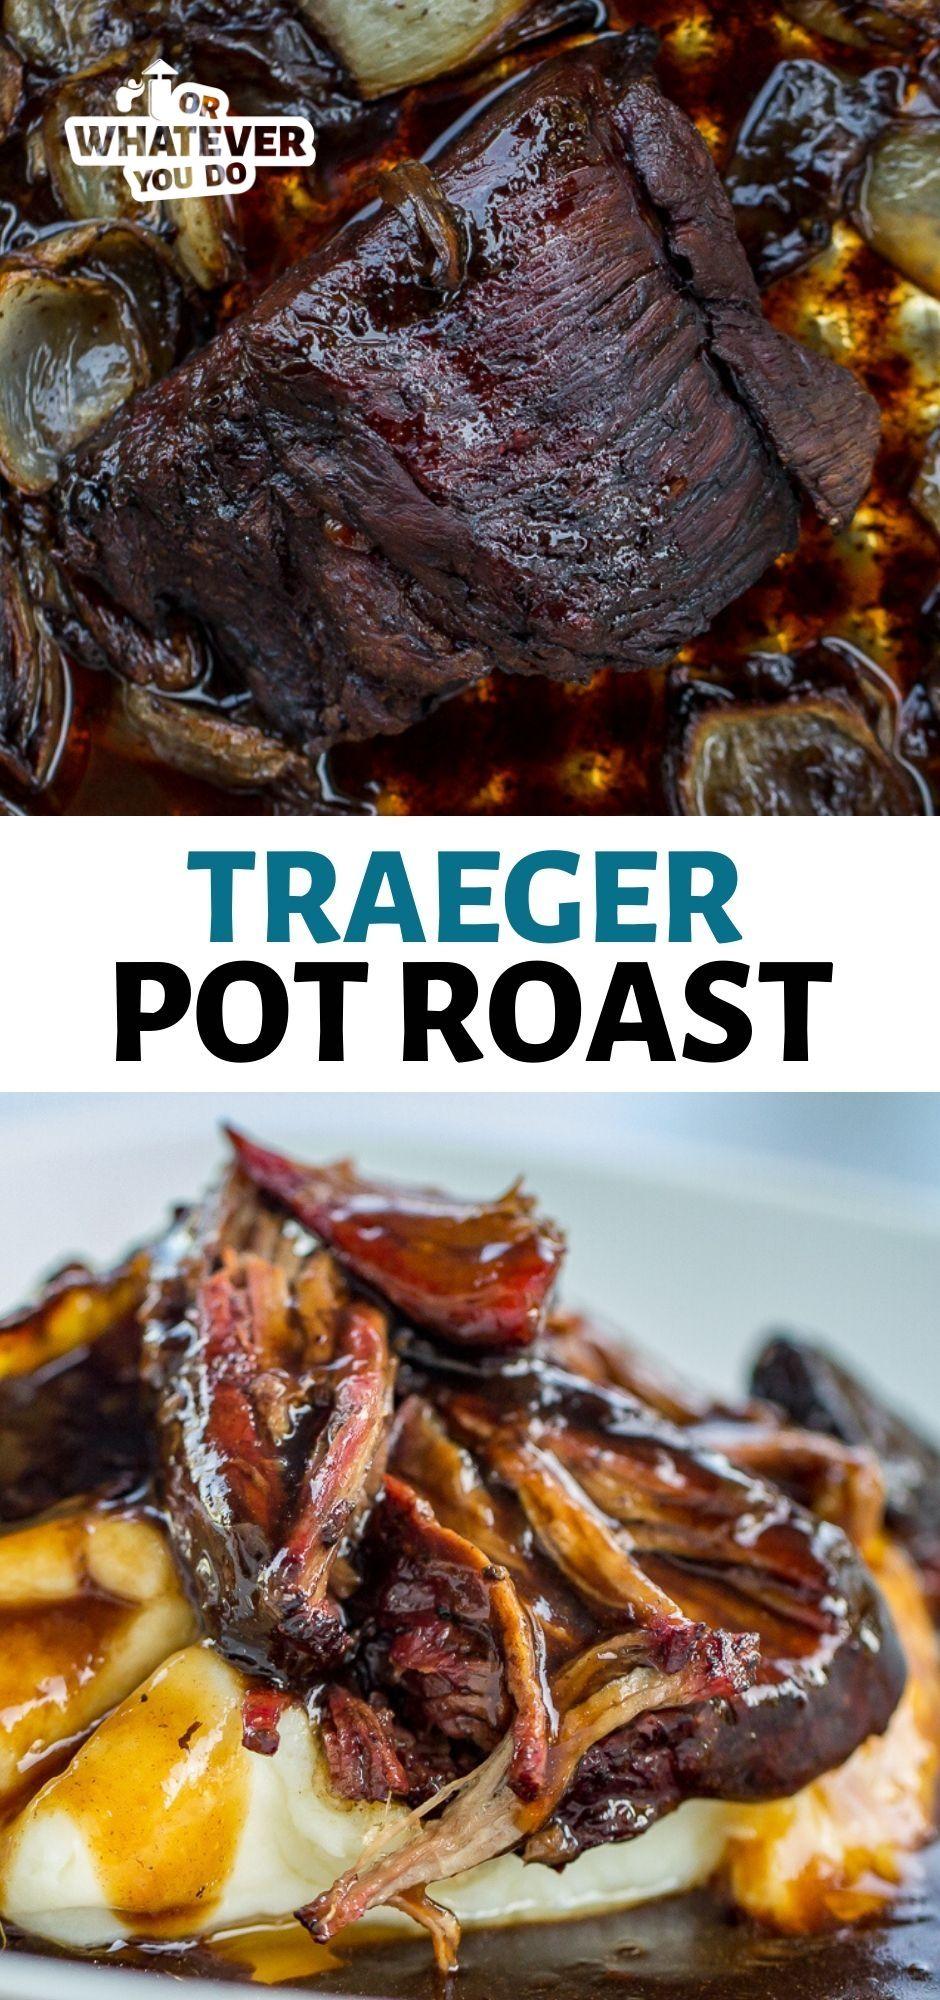 Traeger Pot Roast | Recipe in 2020 | Pot roast, Best pot ...